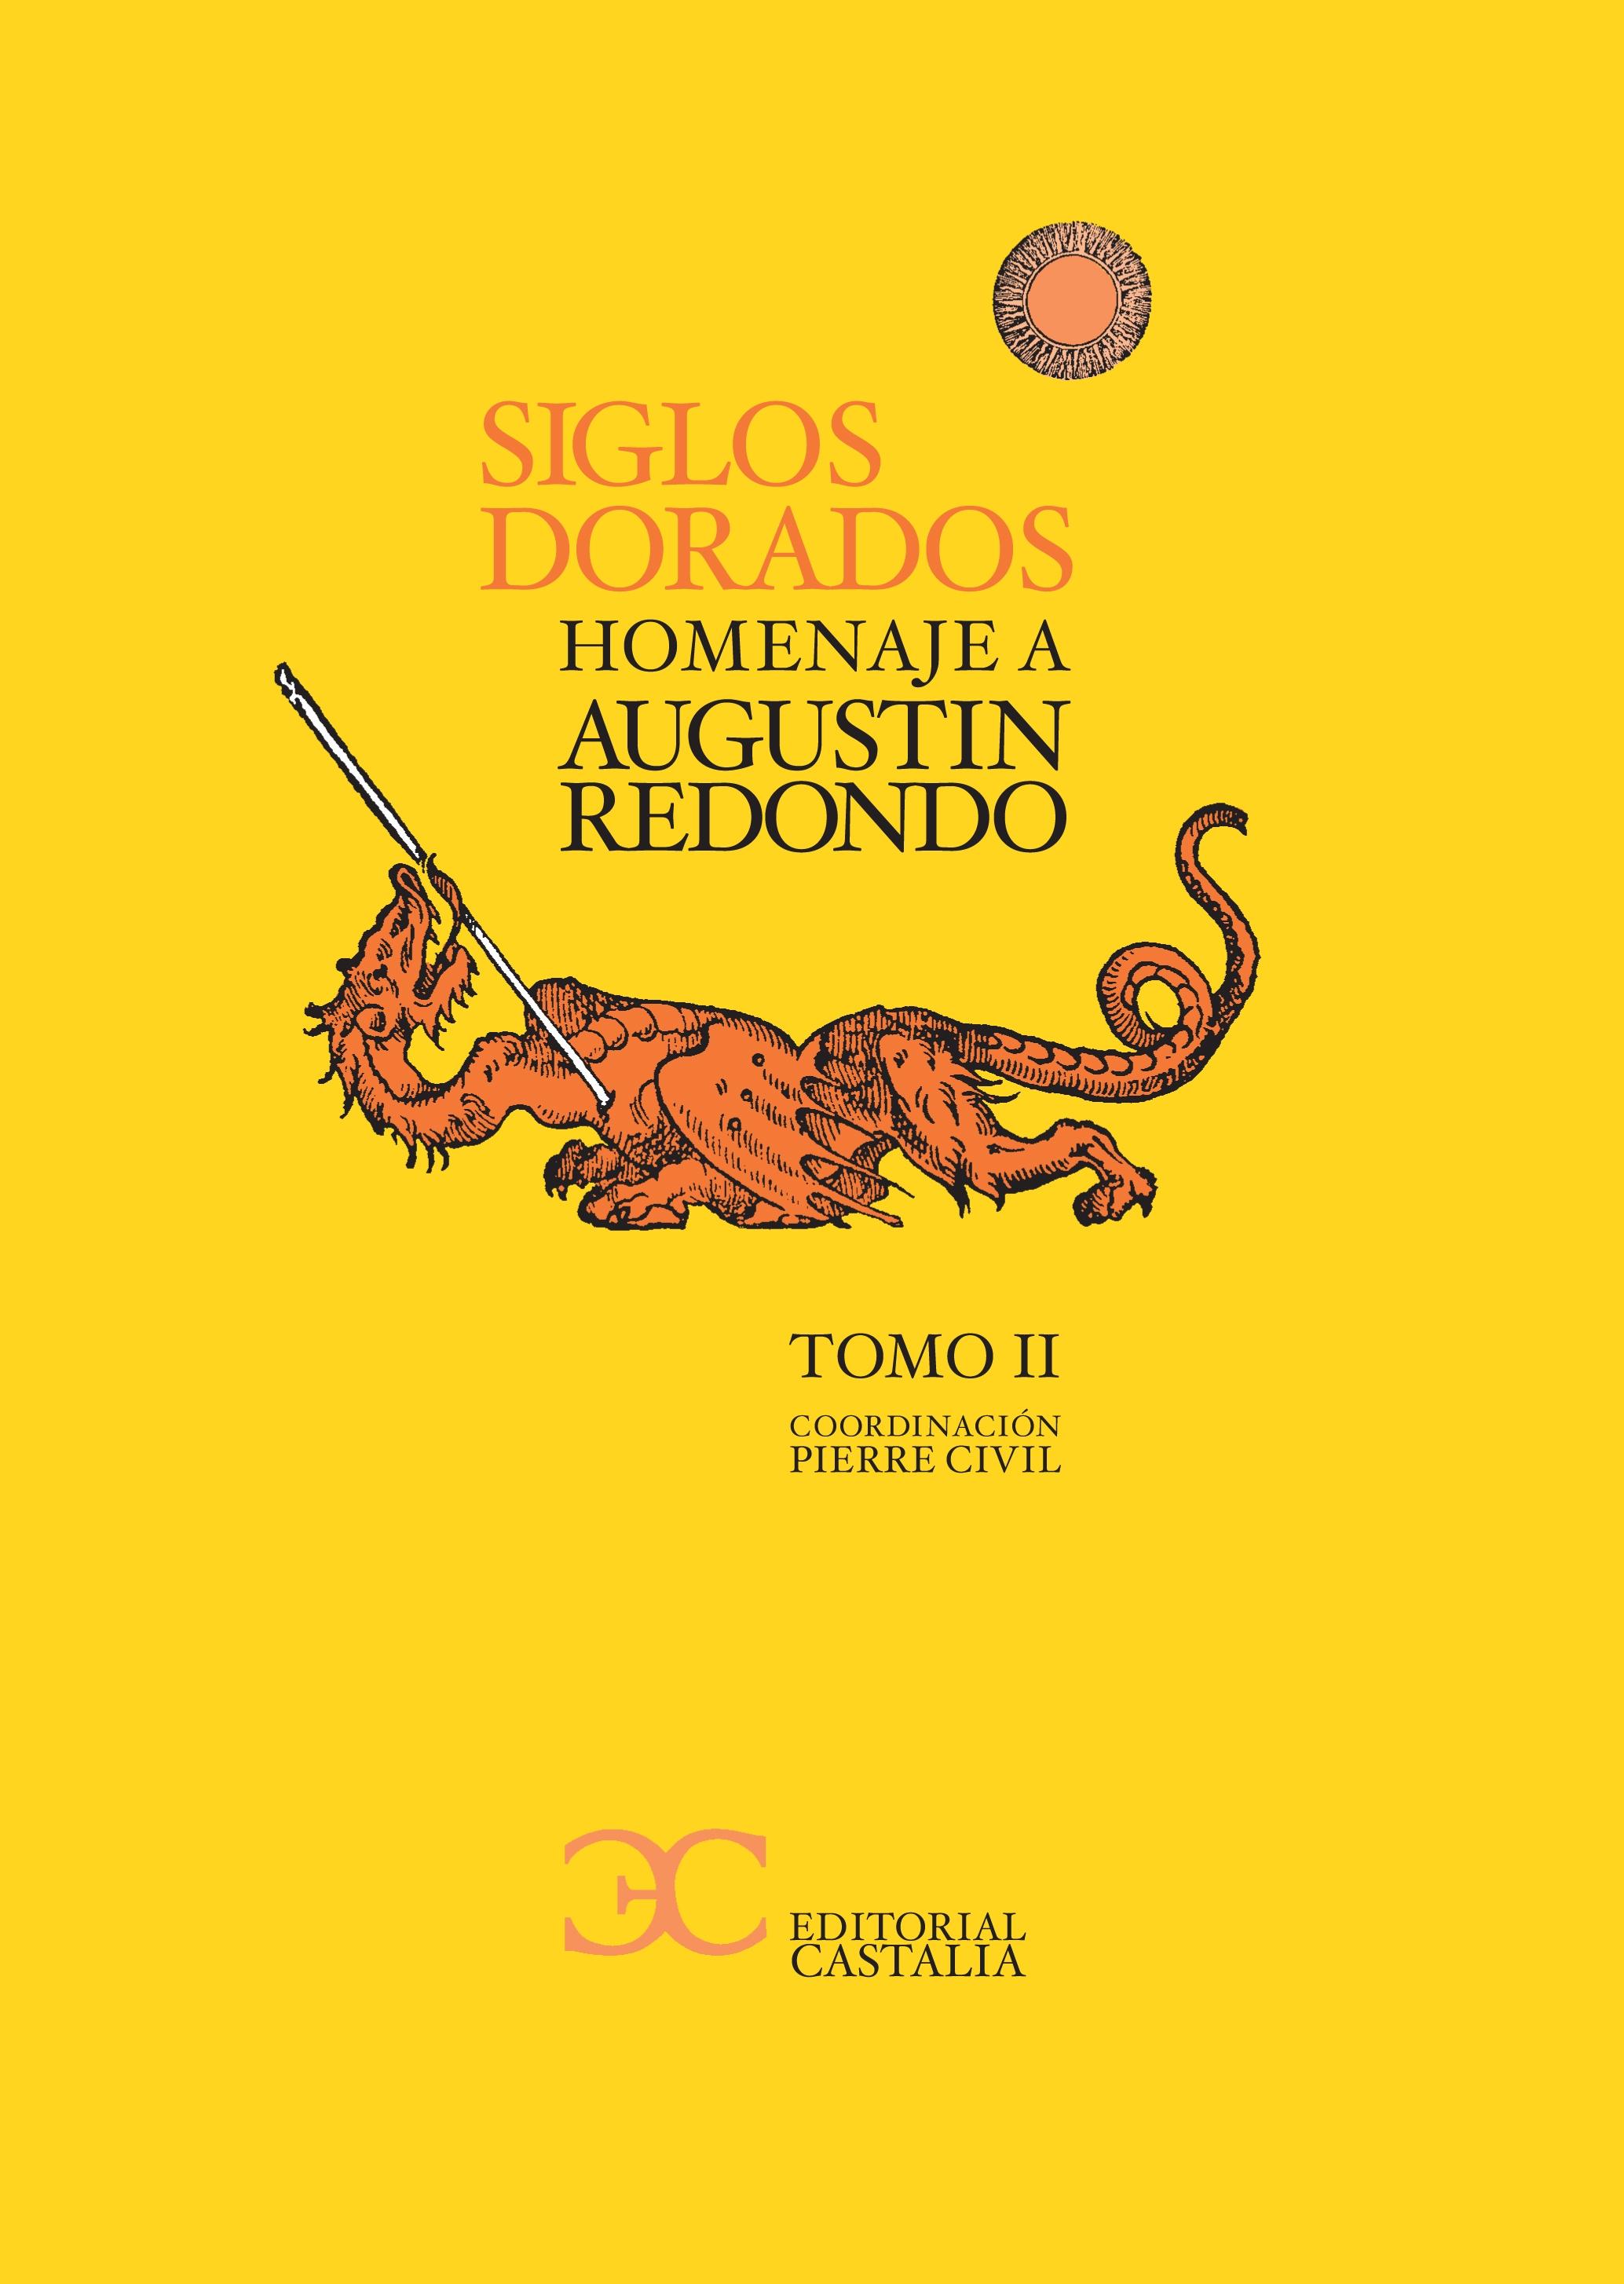 Los siglos Dorados. Homenaje a Agustín Redondo II